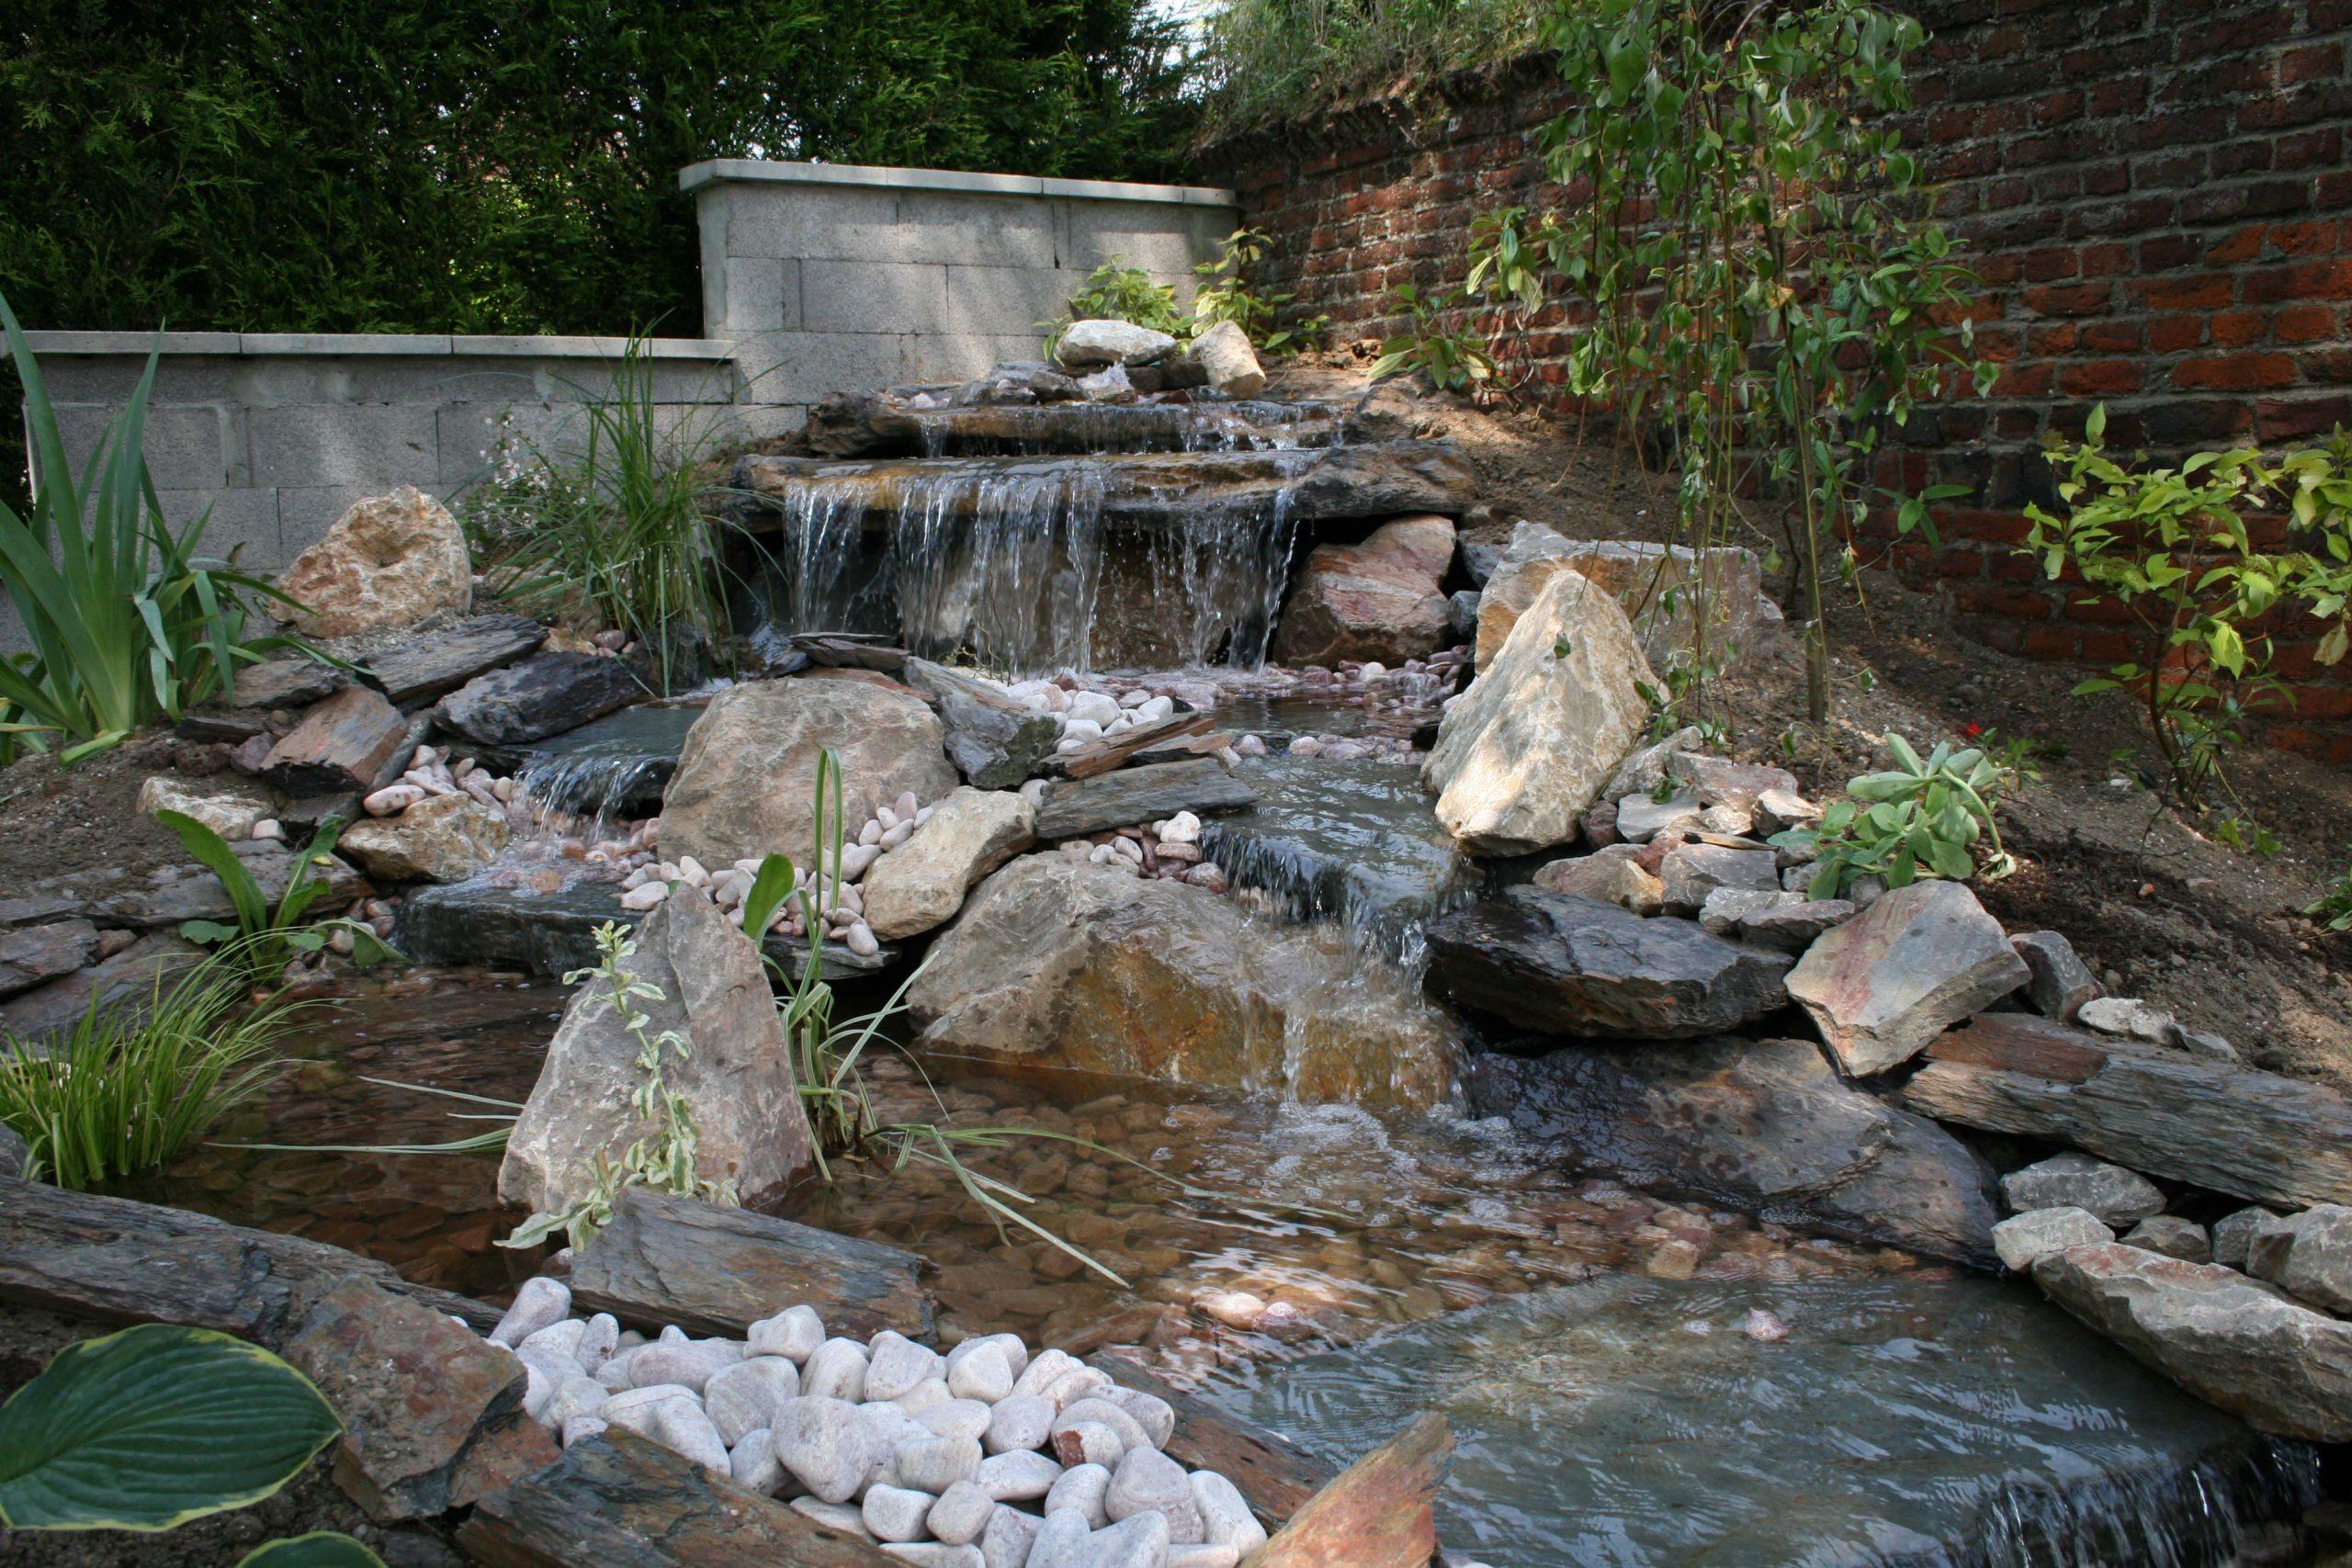 Cuisine: Ment Construire Sa Cascade Expert Bassin Cascade ... concernant Bassin Jardin Préformé